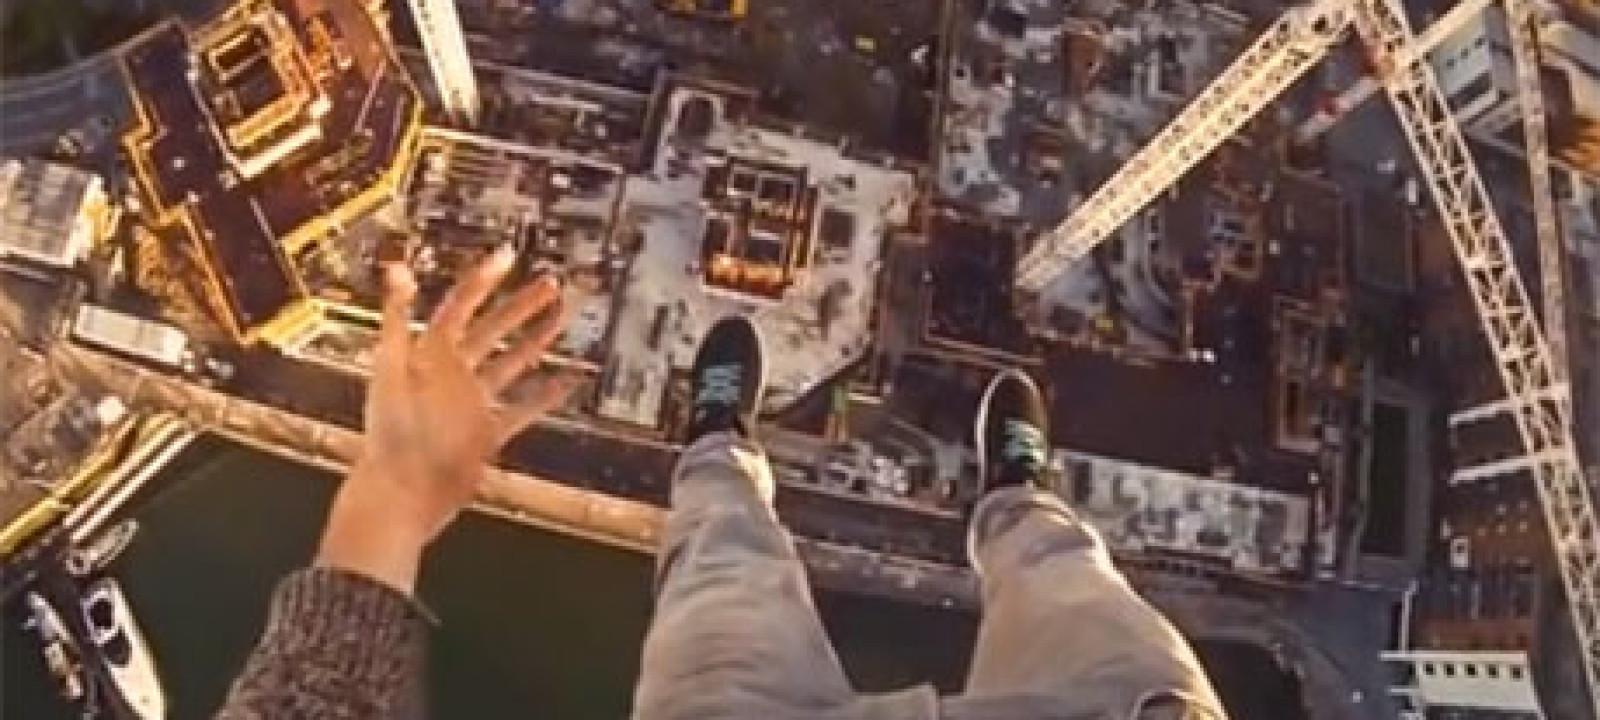 James Kingston's viral video